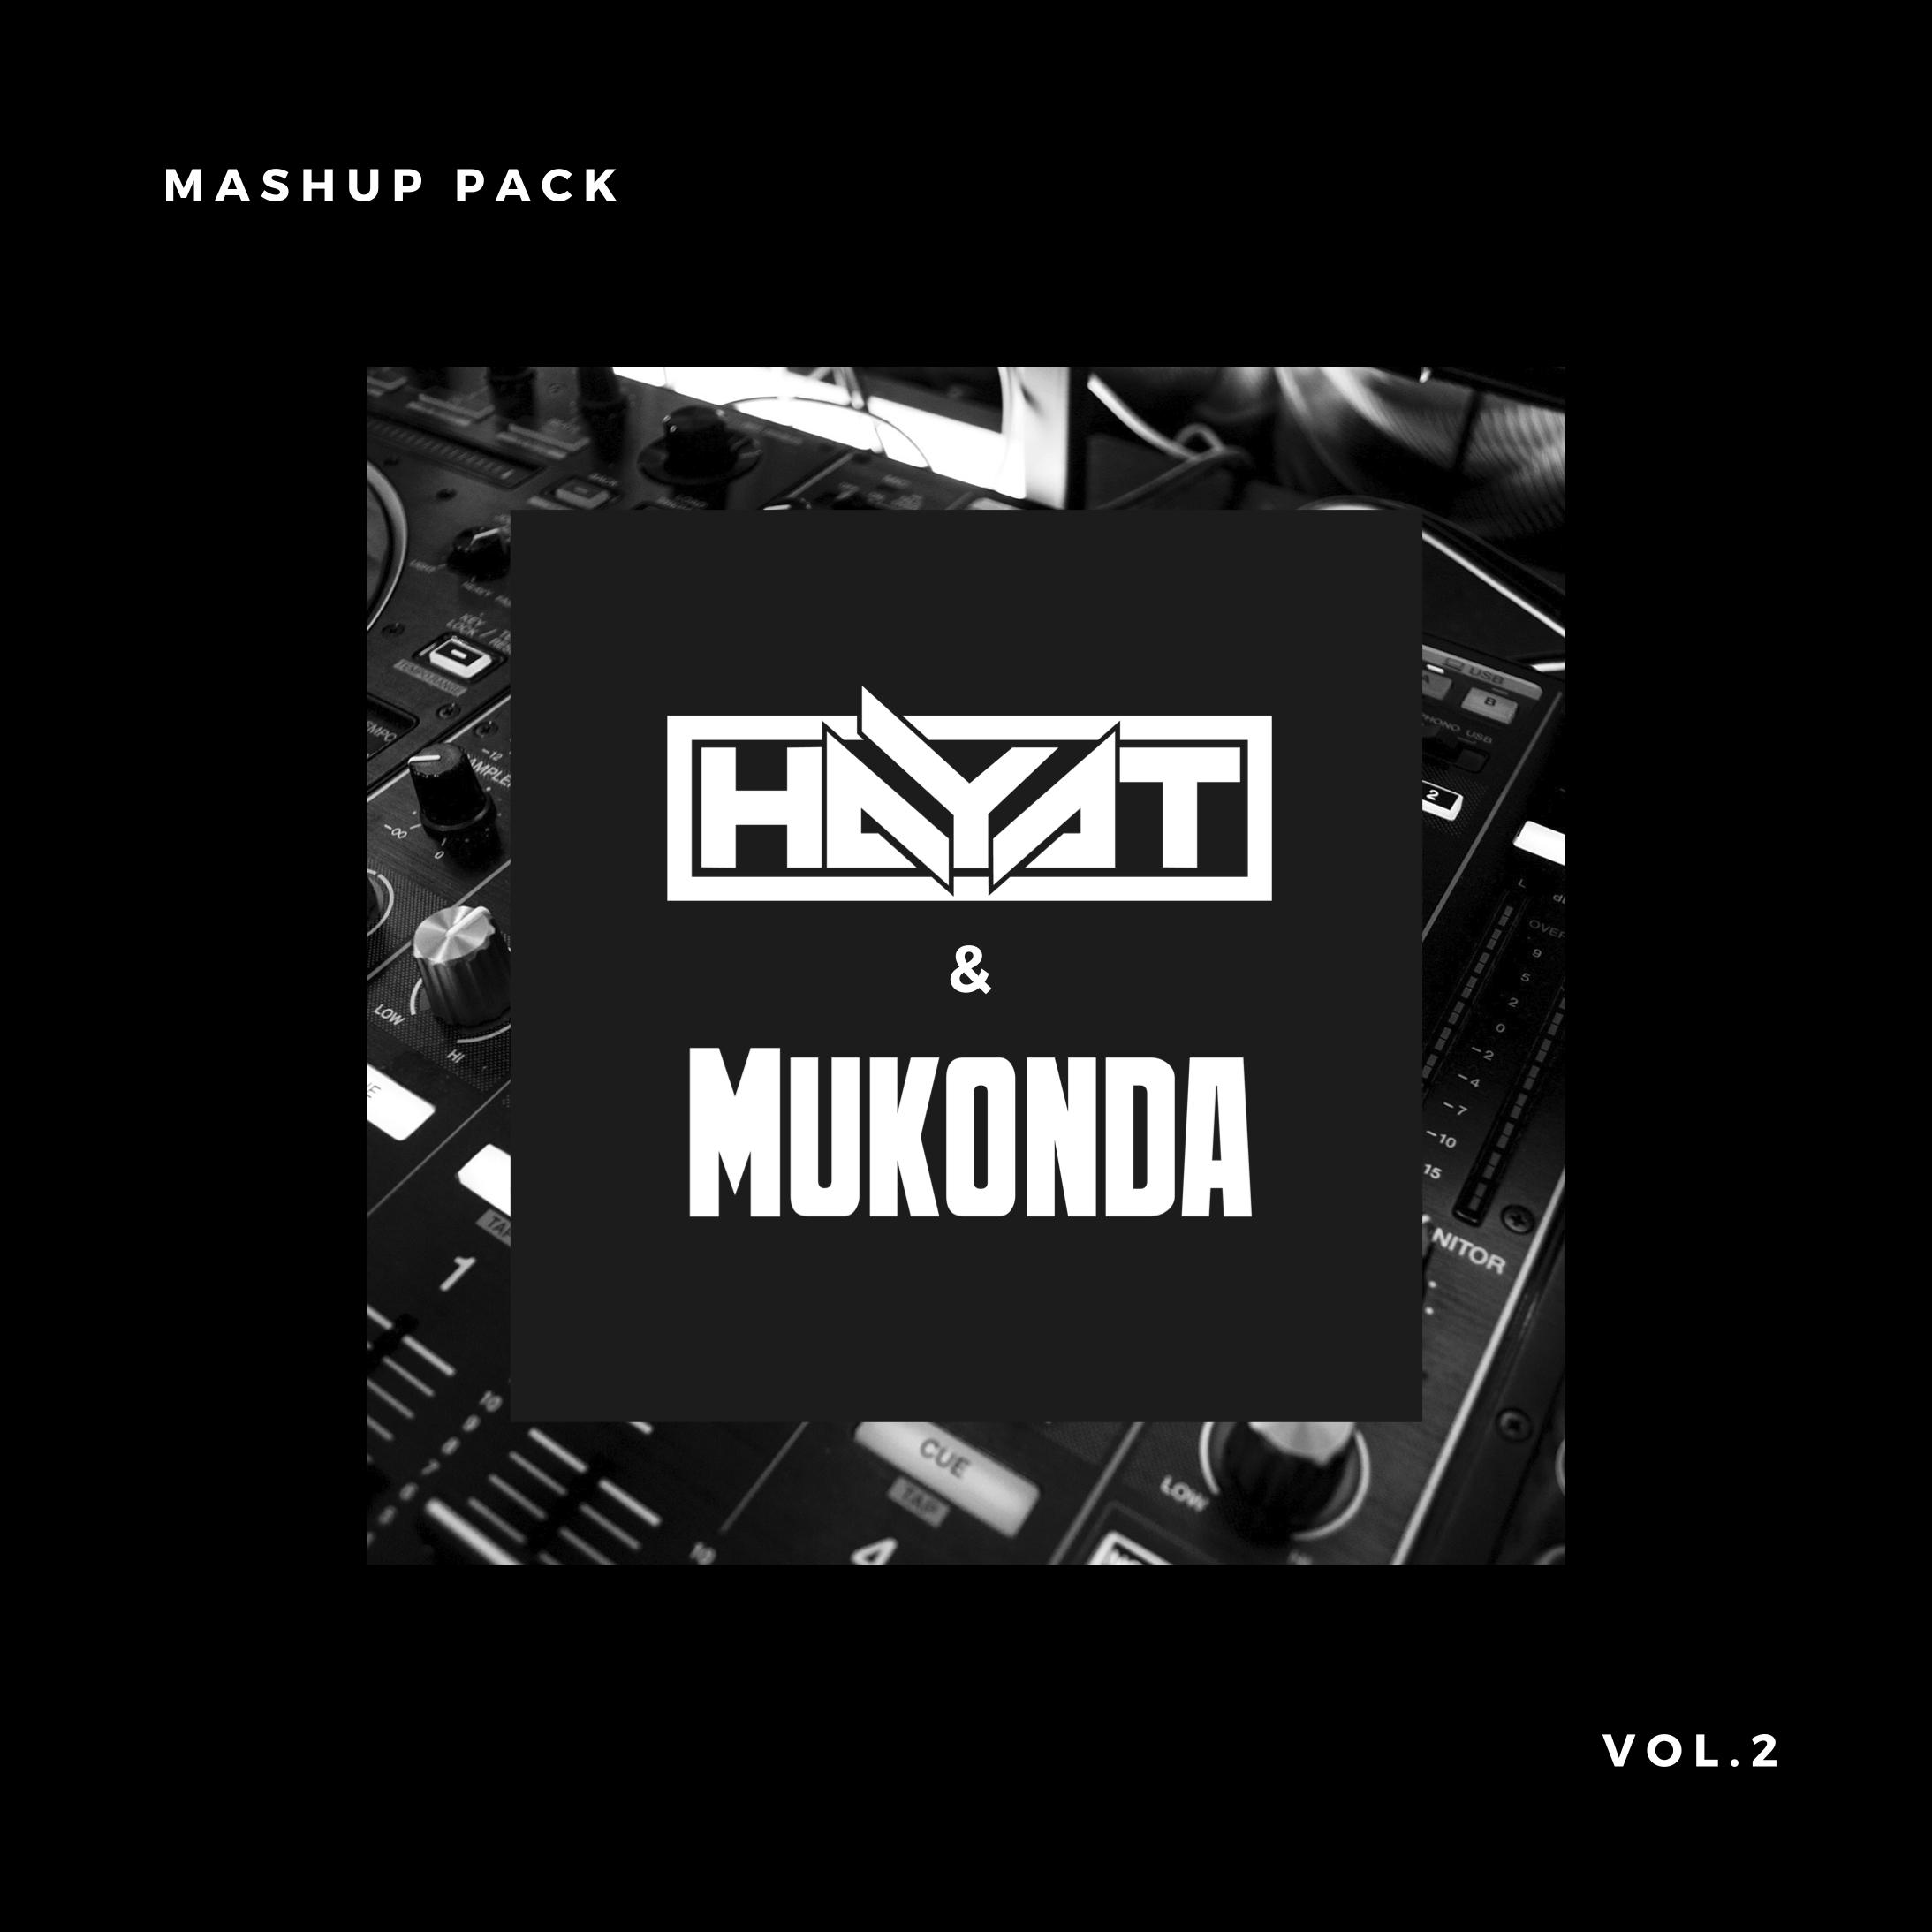 HayaT & Mukonda Mashup Pack Vol.2